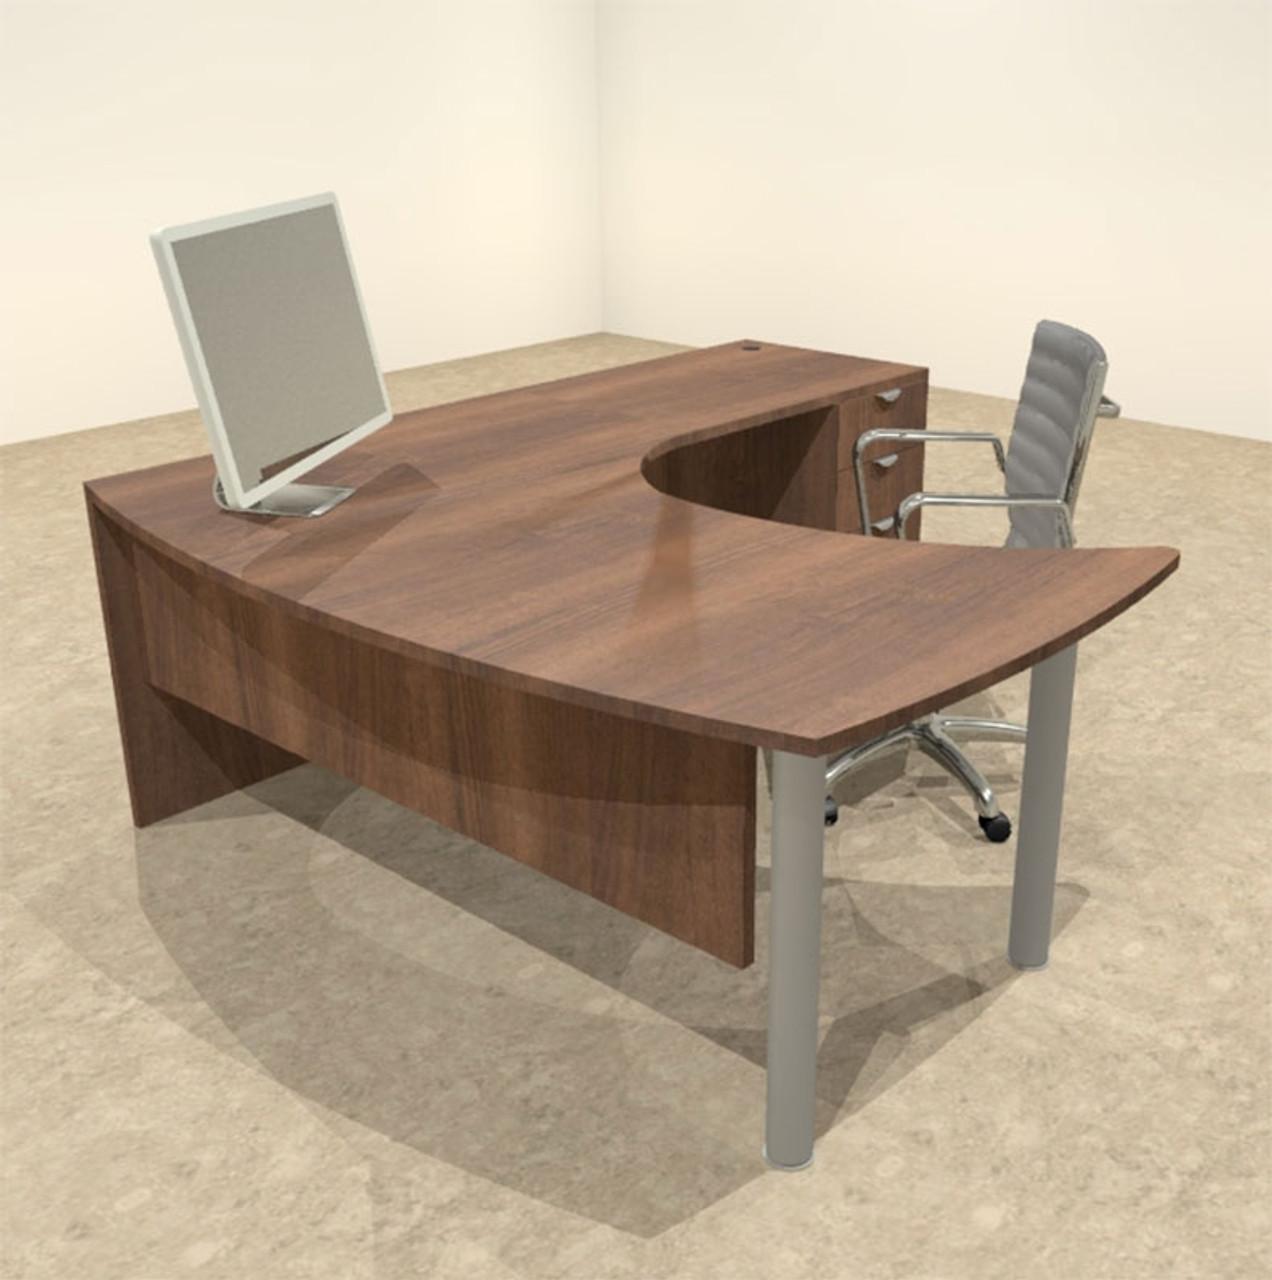 Sensational 3Pc L Shaped Modern Contemporary Executive Office Desk Set Of Con L14 Interior Design Ideas Inesswwsoteloinfo